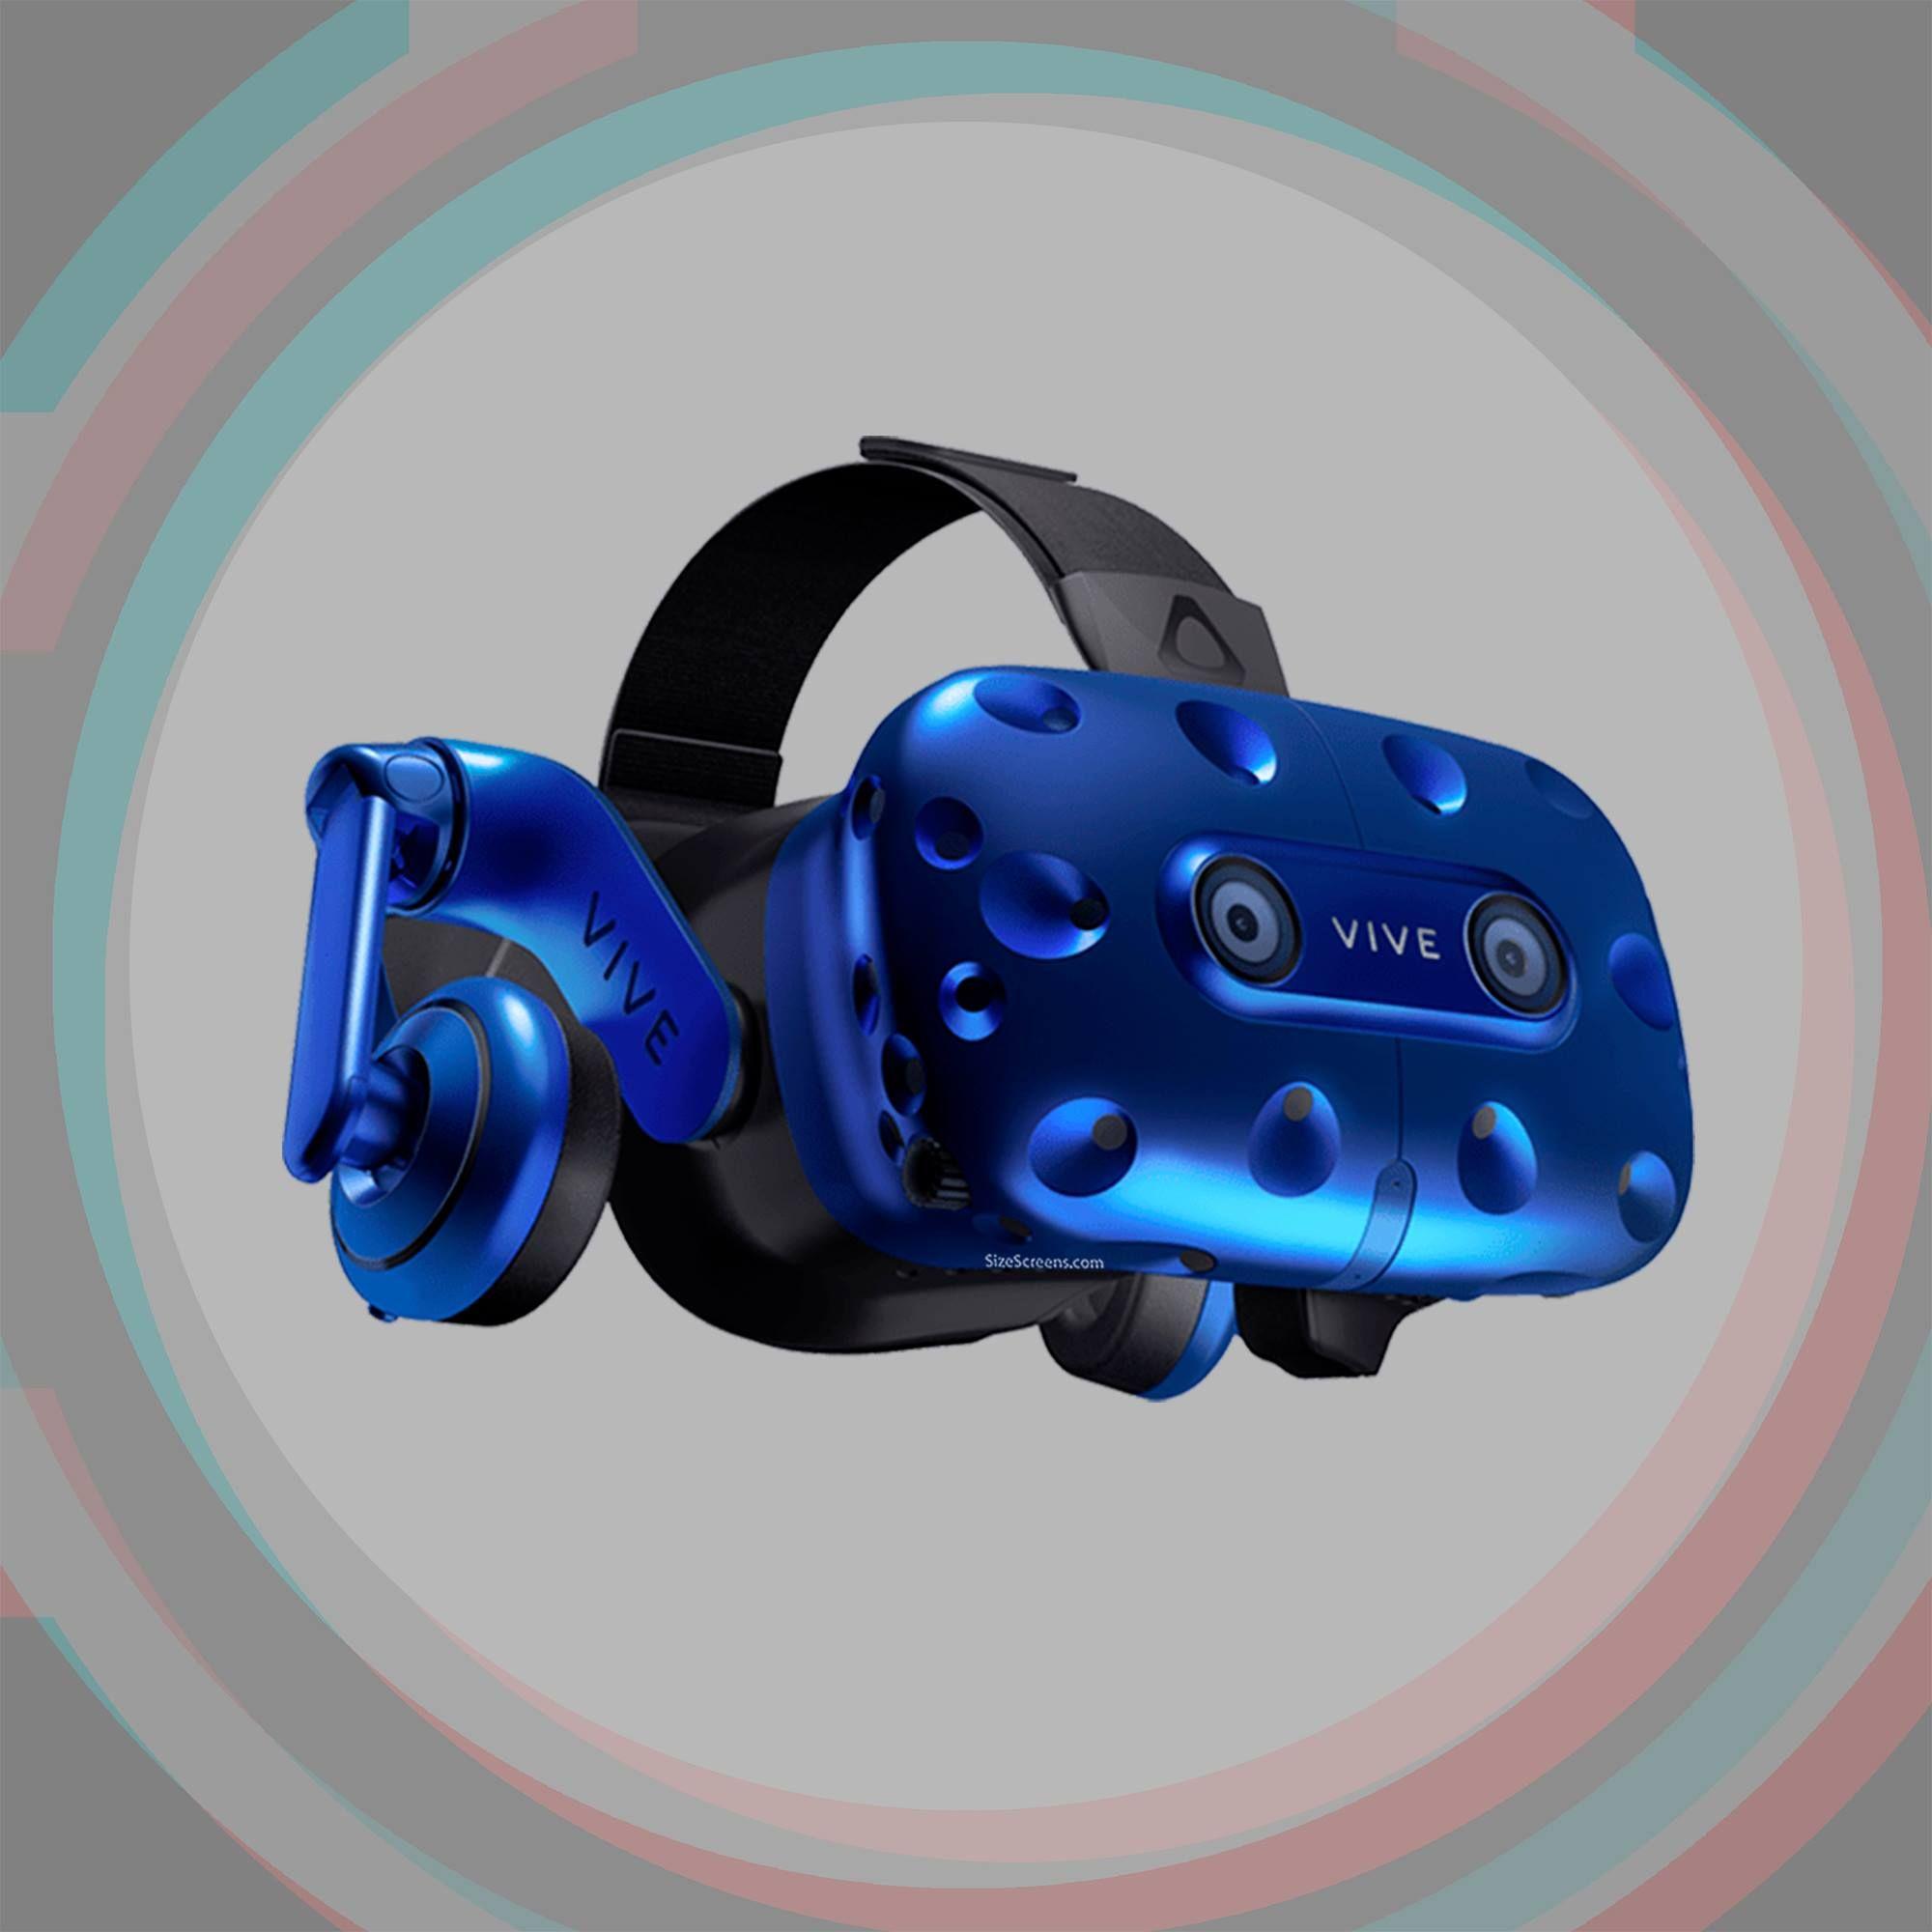 HTC VIVE Pro Specifications Pixel density, Vr headset